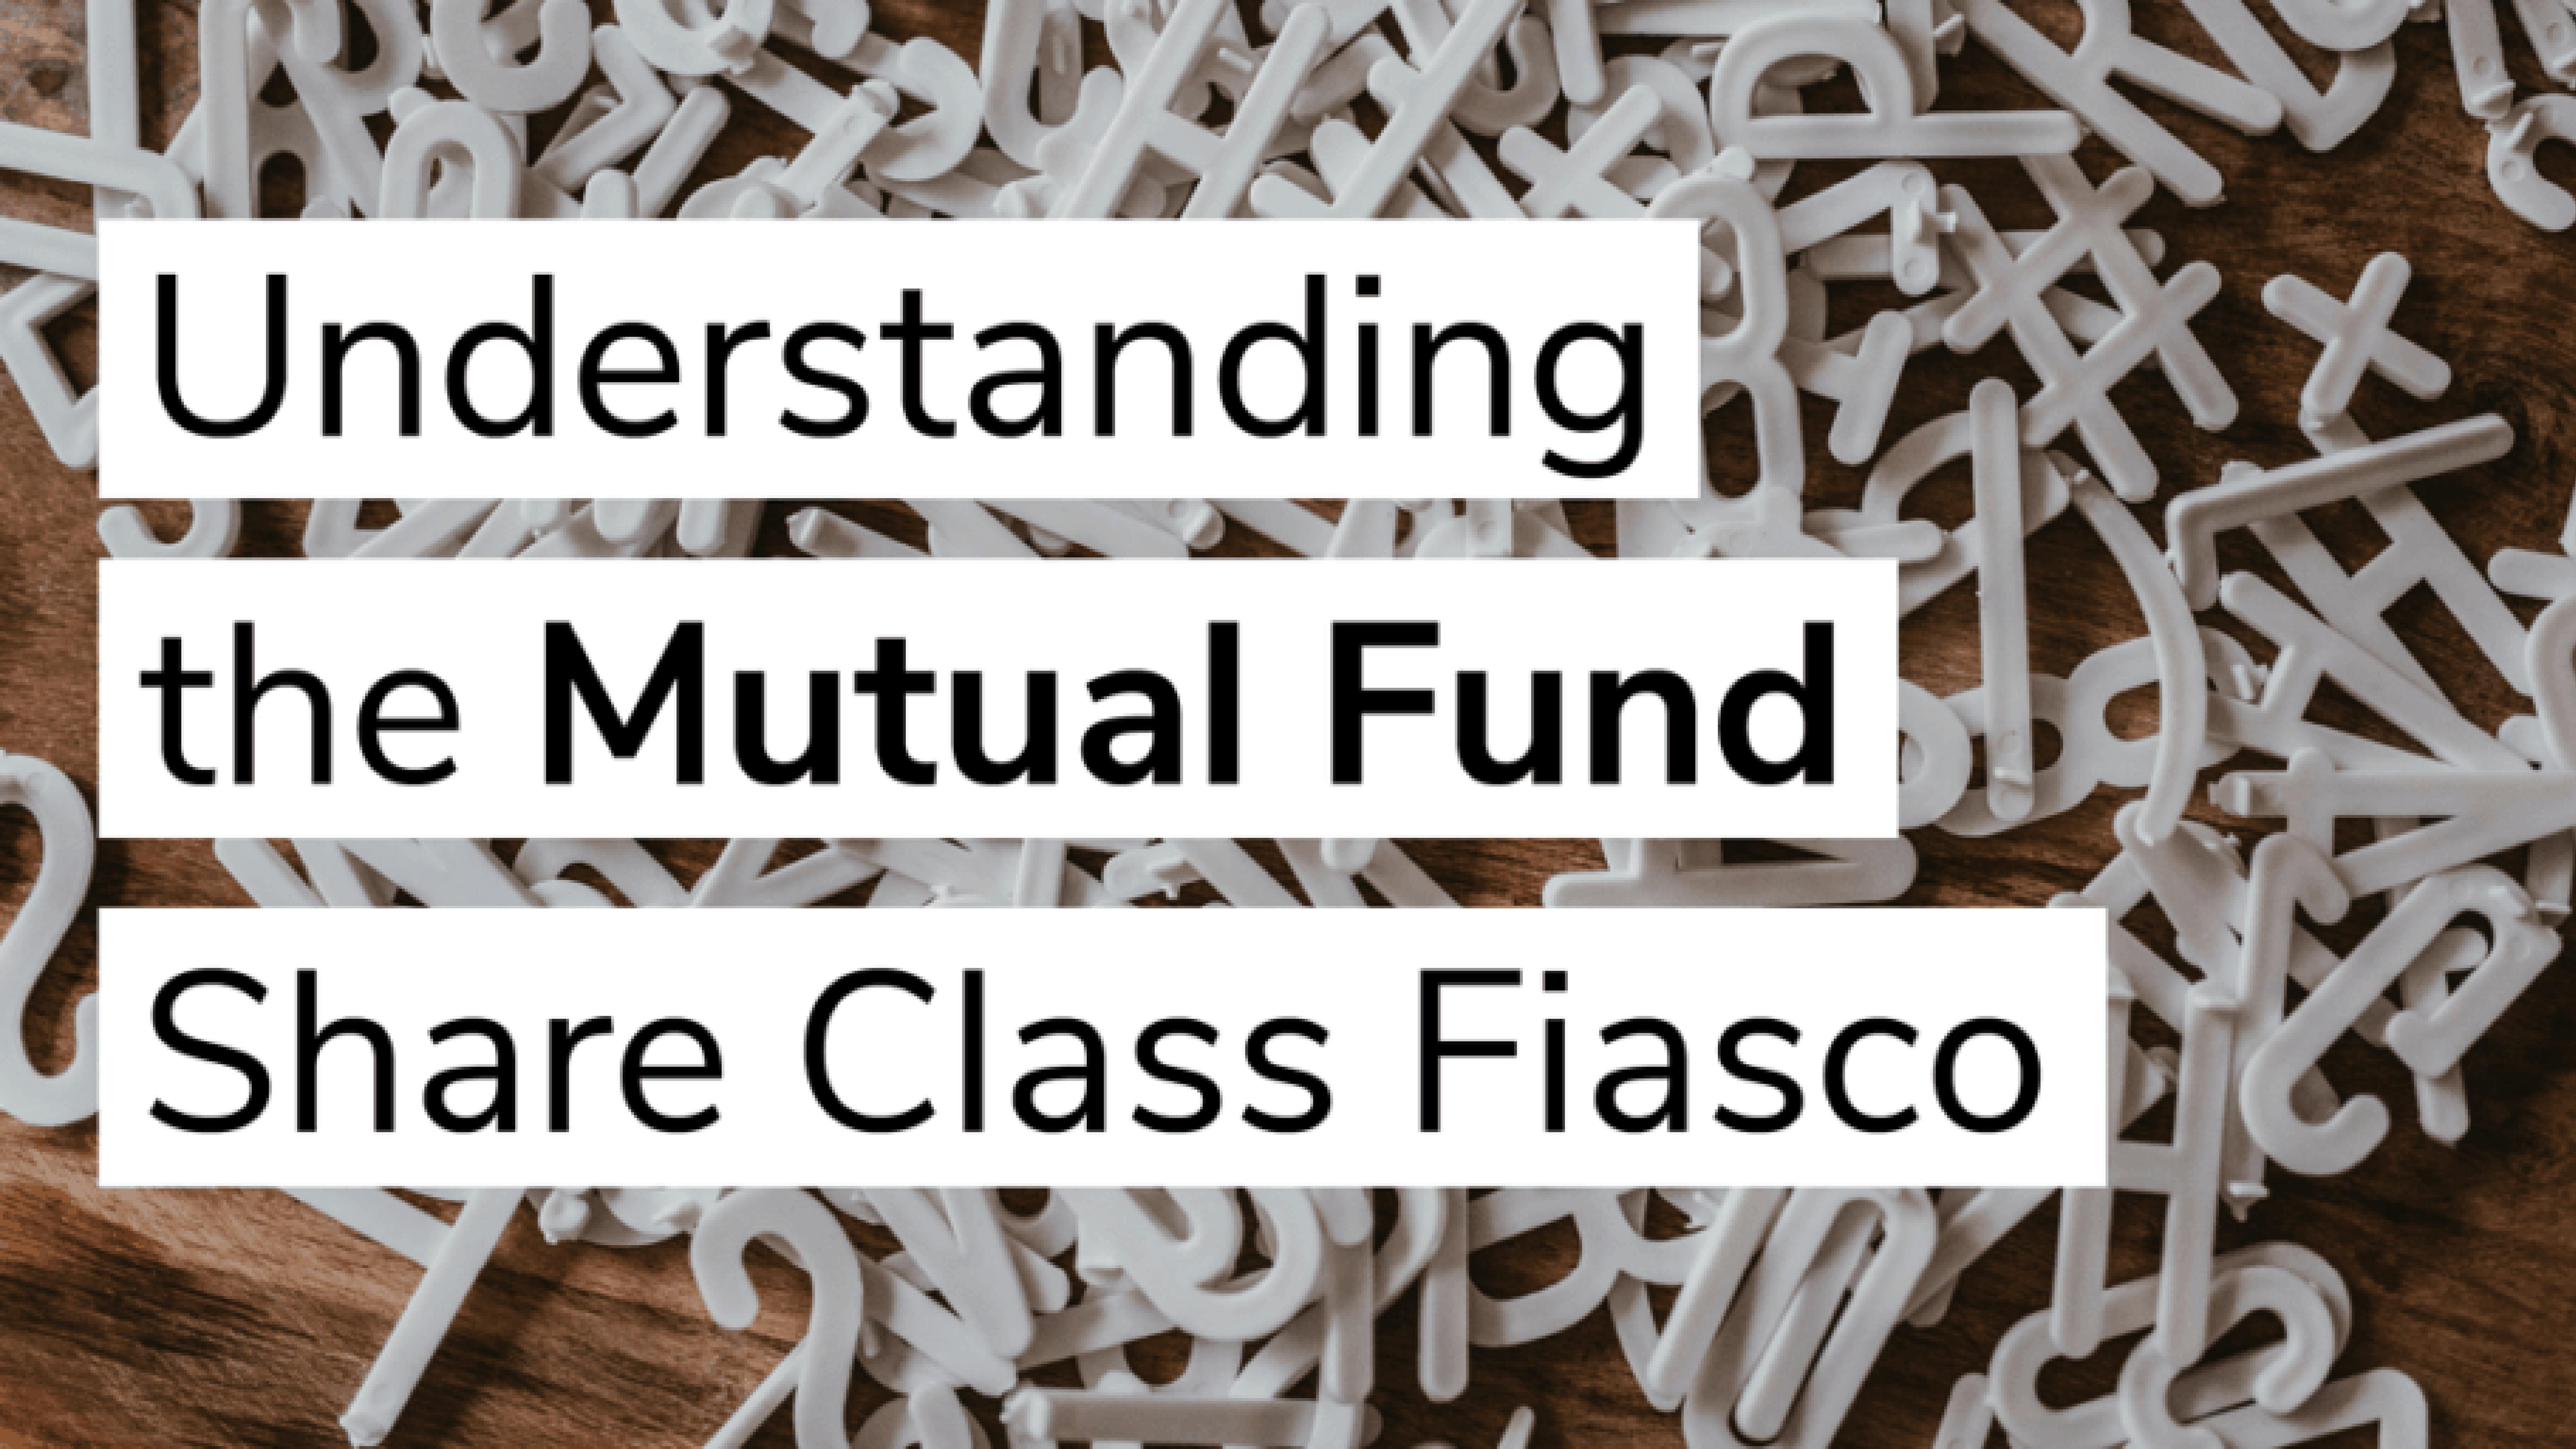 Understanding the Mutual Fund Share Class Fiasco